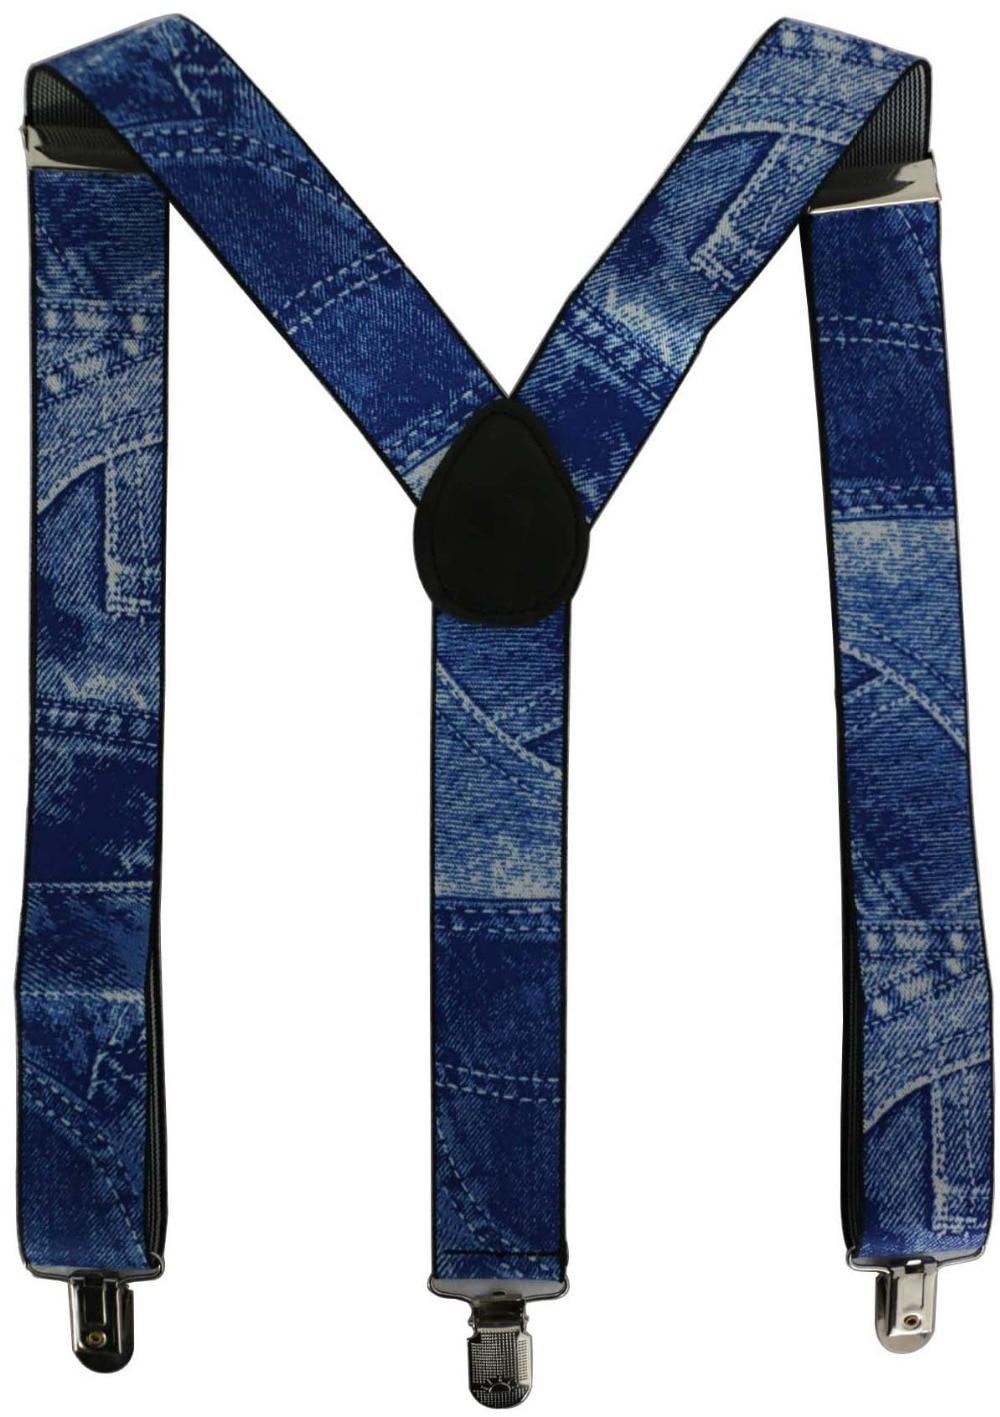 2018 Pants Braces Free Ship New 3.5cm Wide Adustable 3 Clips Denim Blue Braces For Mens Male Adjustable Elastic X Back